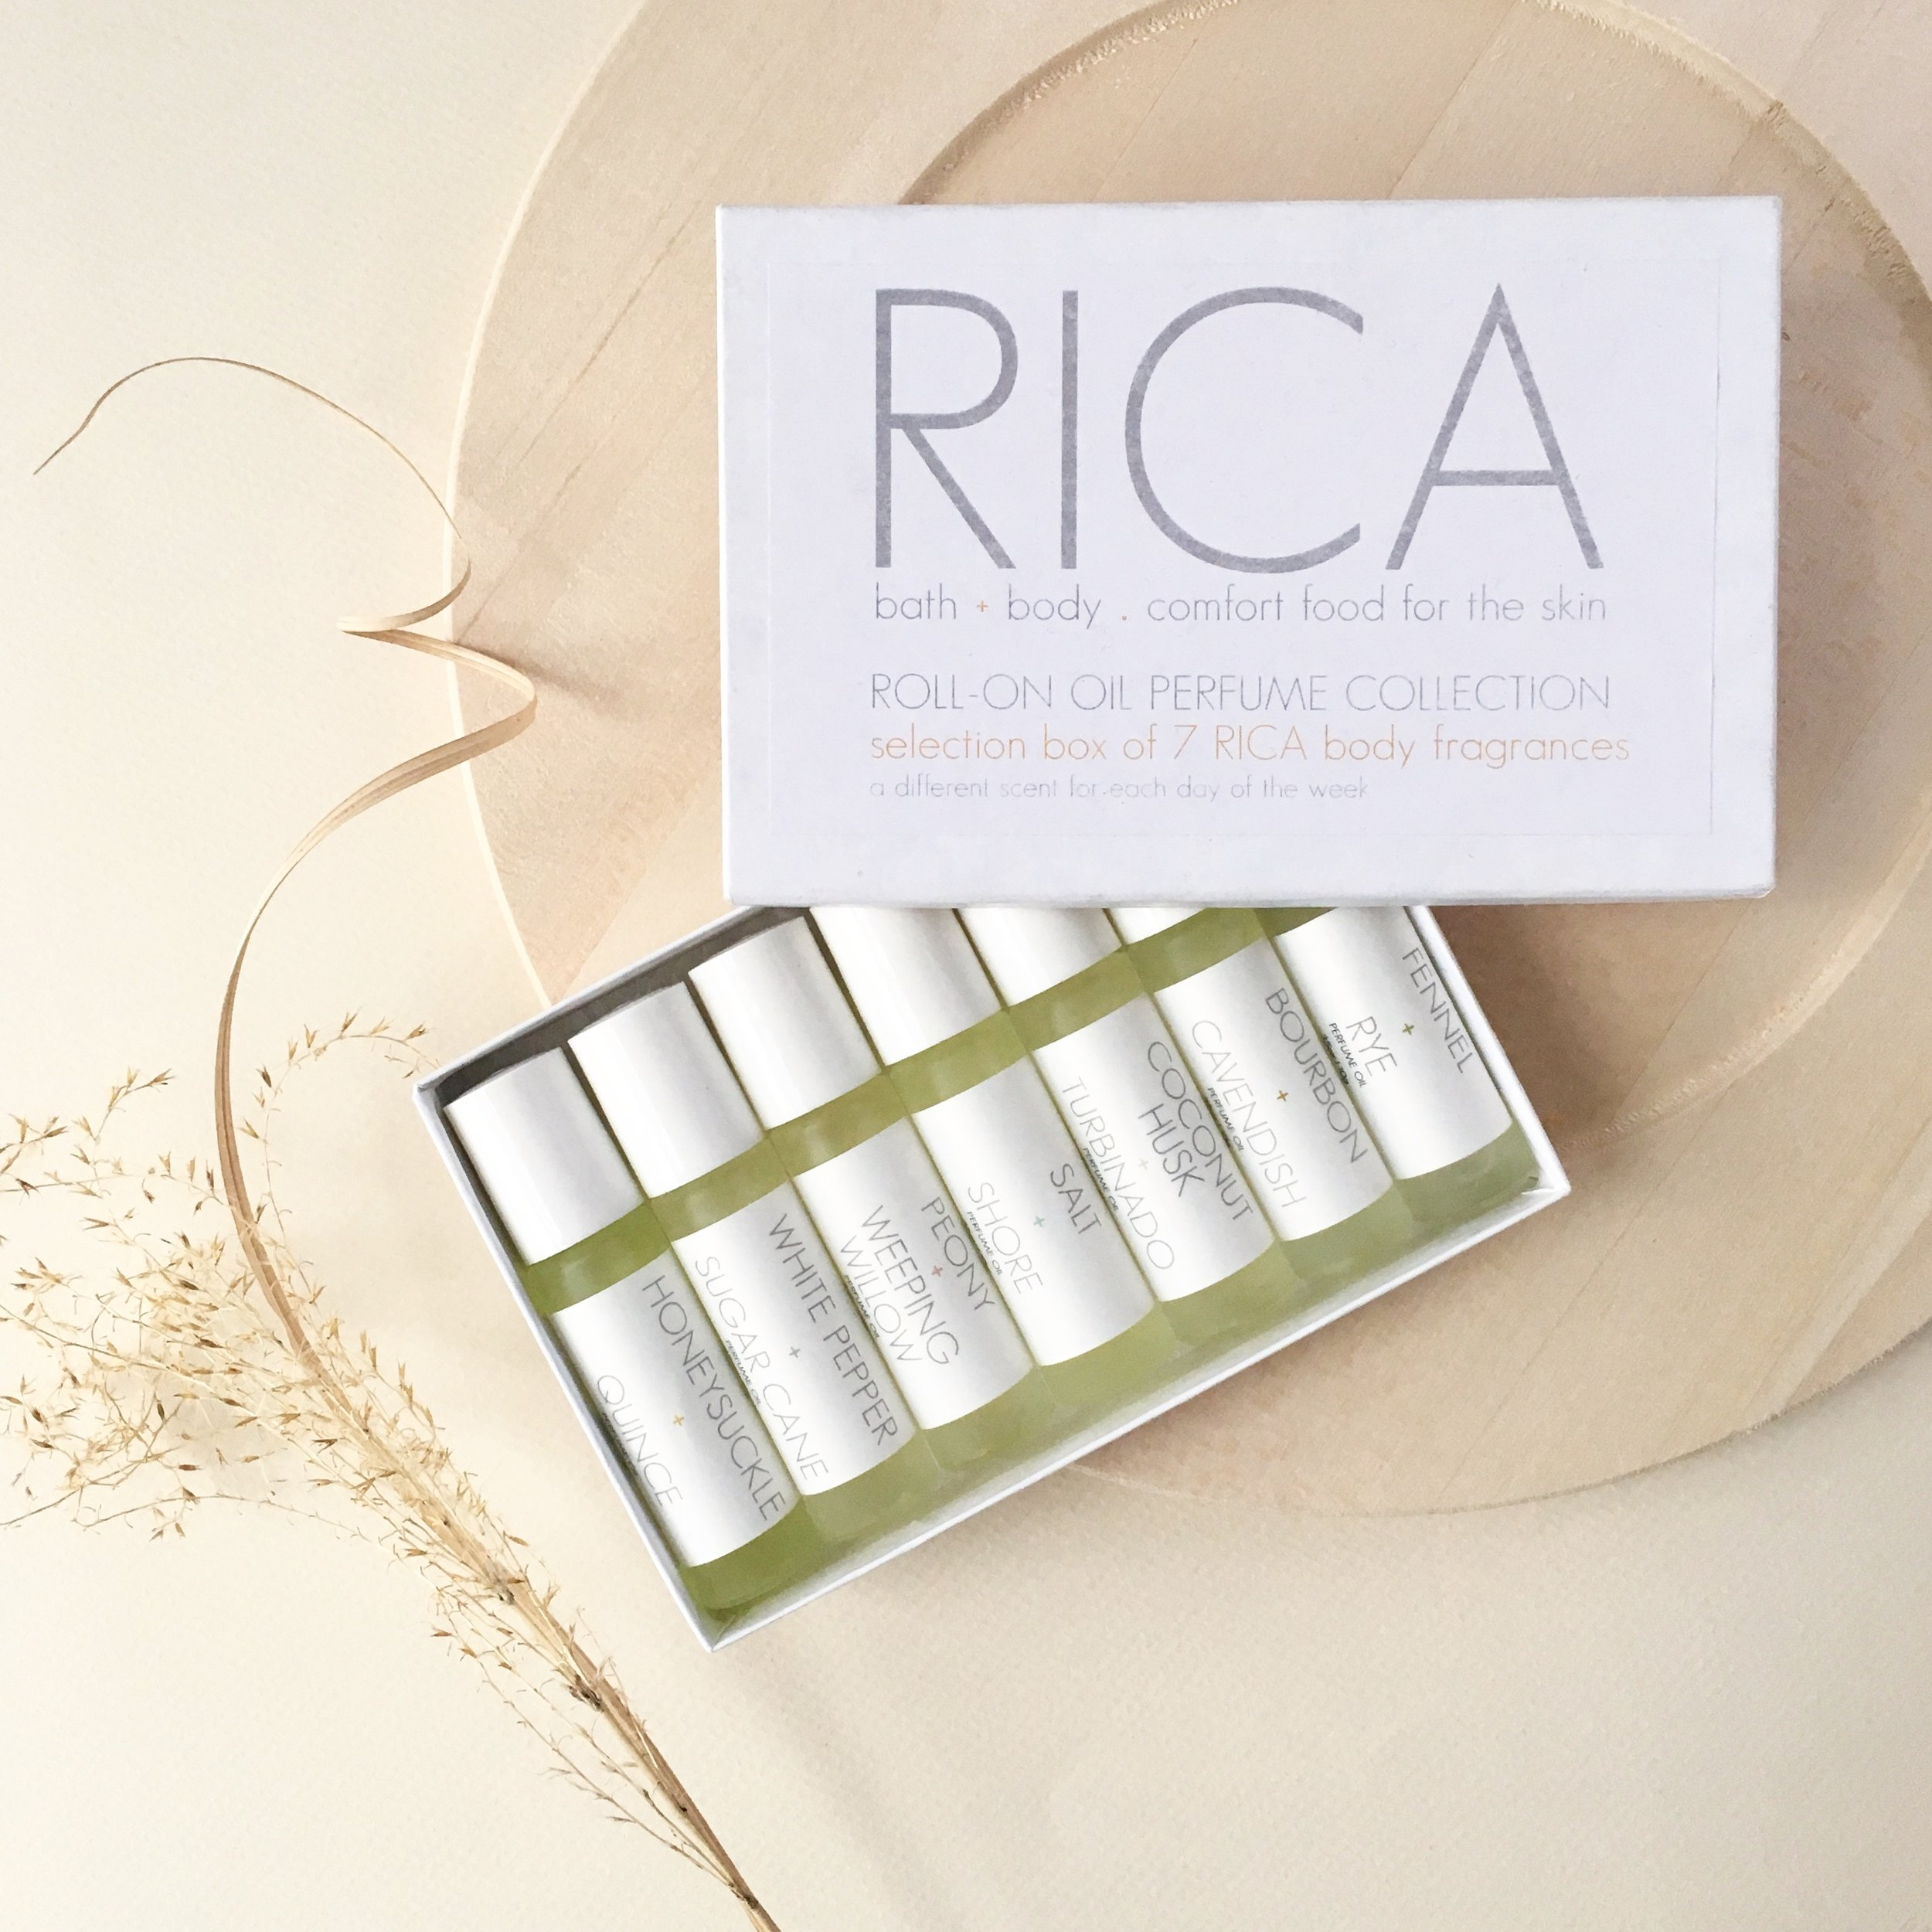 RICA bath + body Roll On Perfume Oil Collection Box.JPG